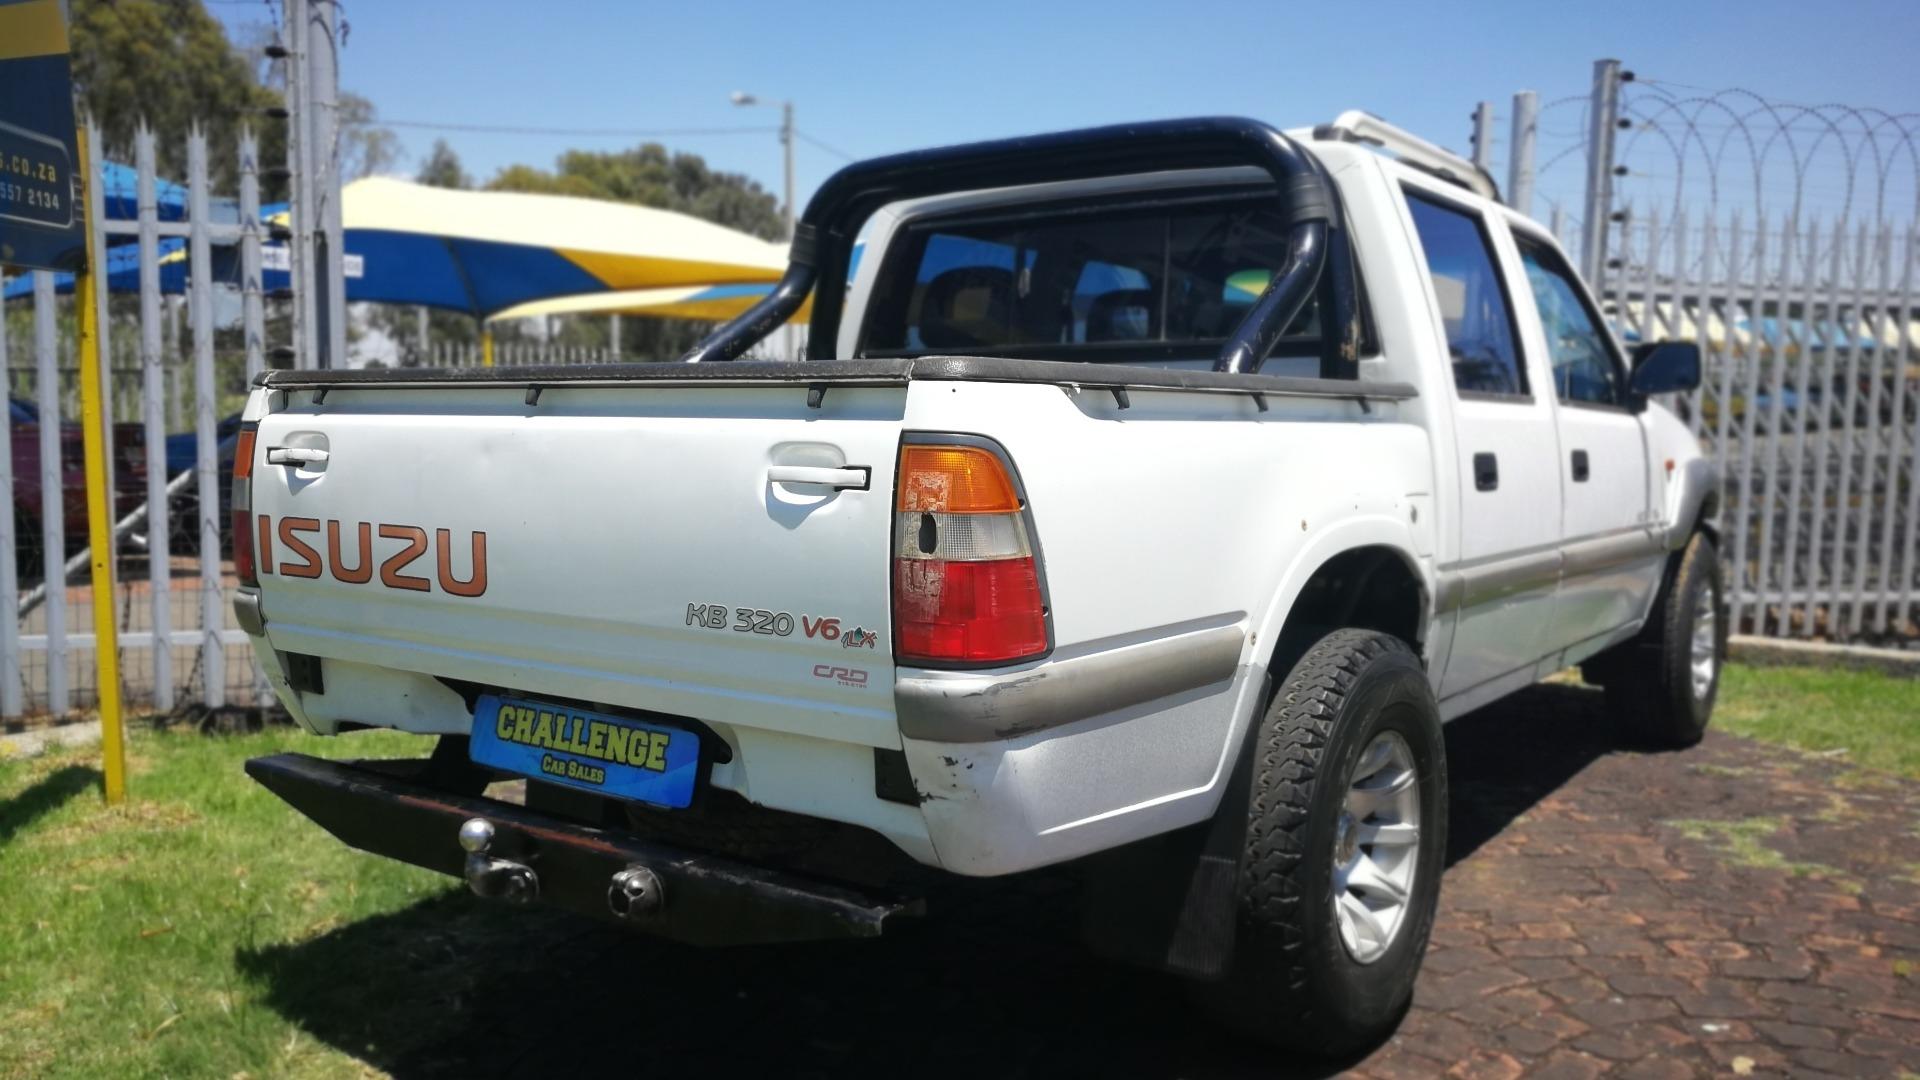 Isuzu Kb Double Cab For Sale In Gauteng